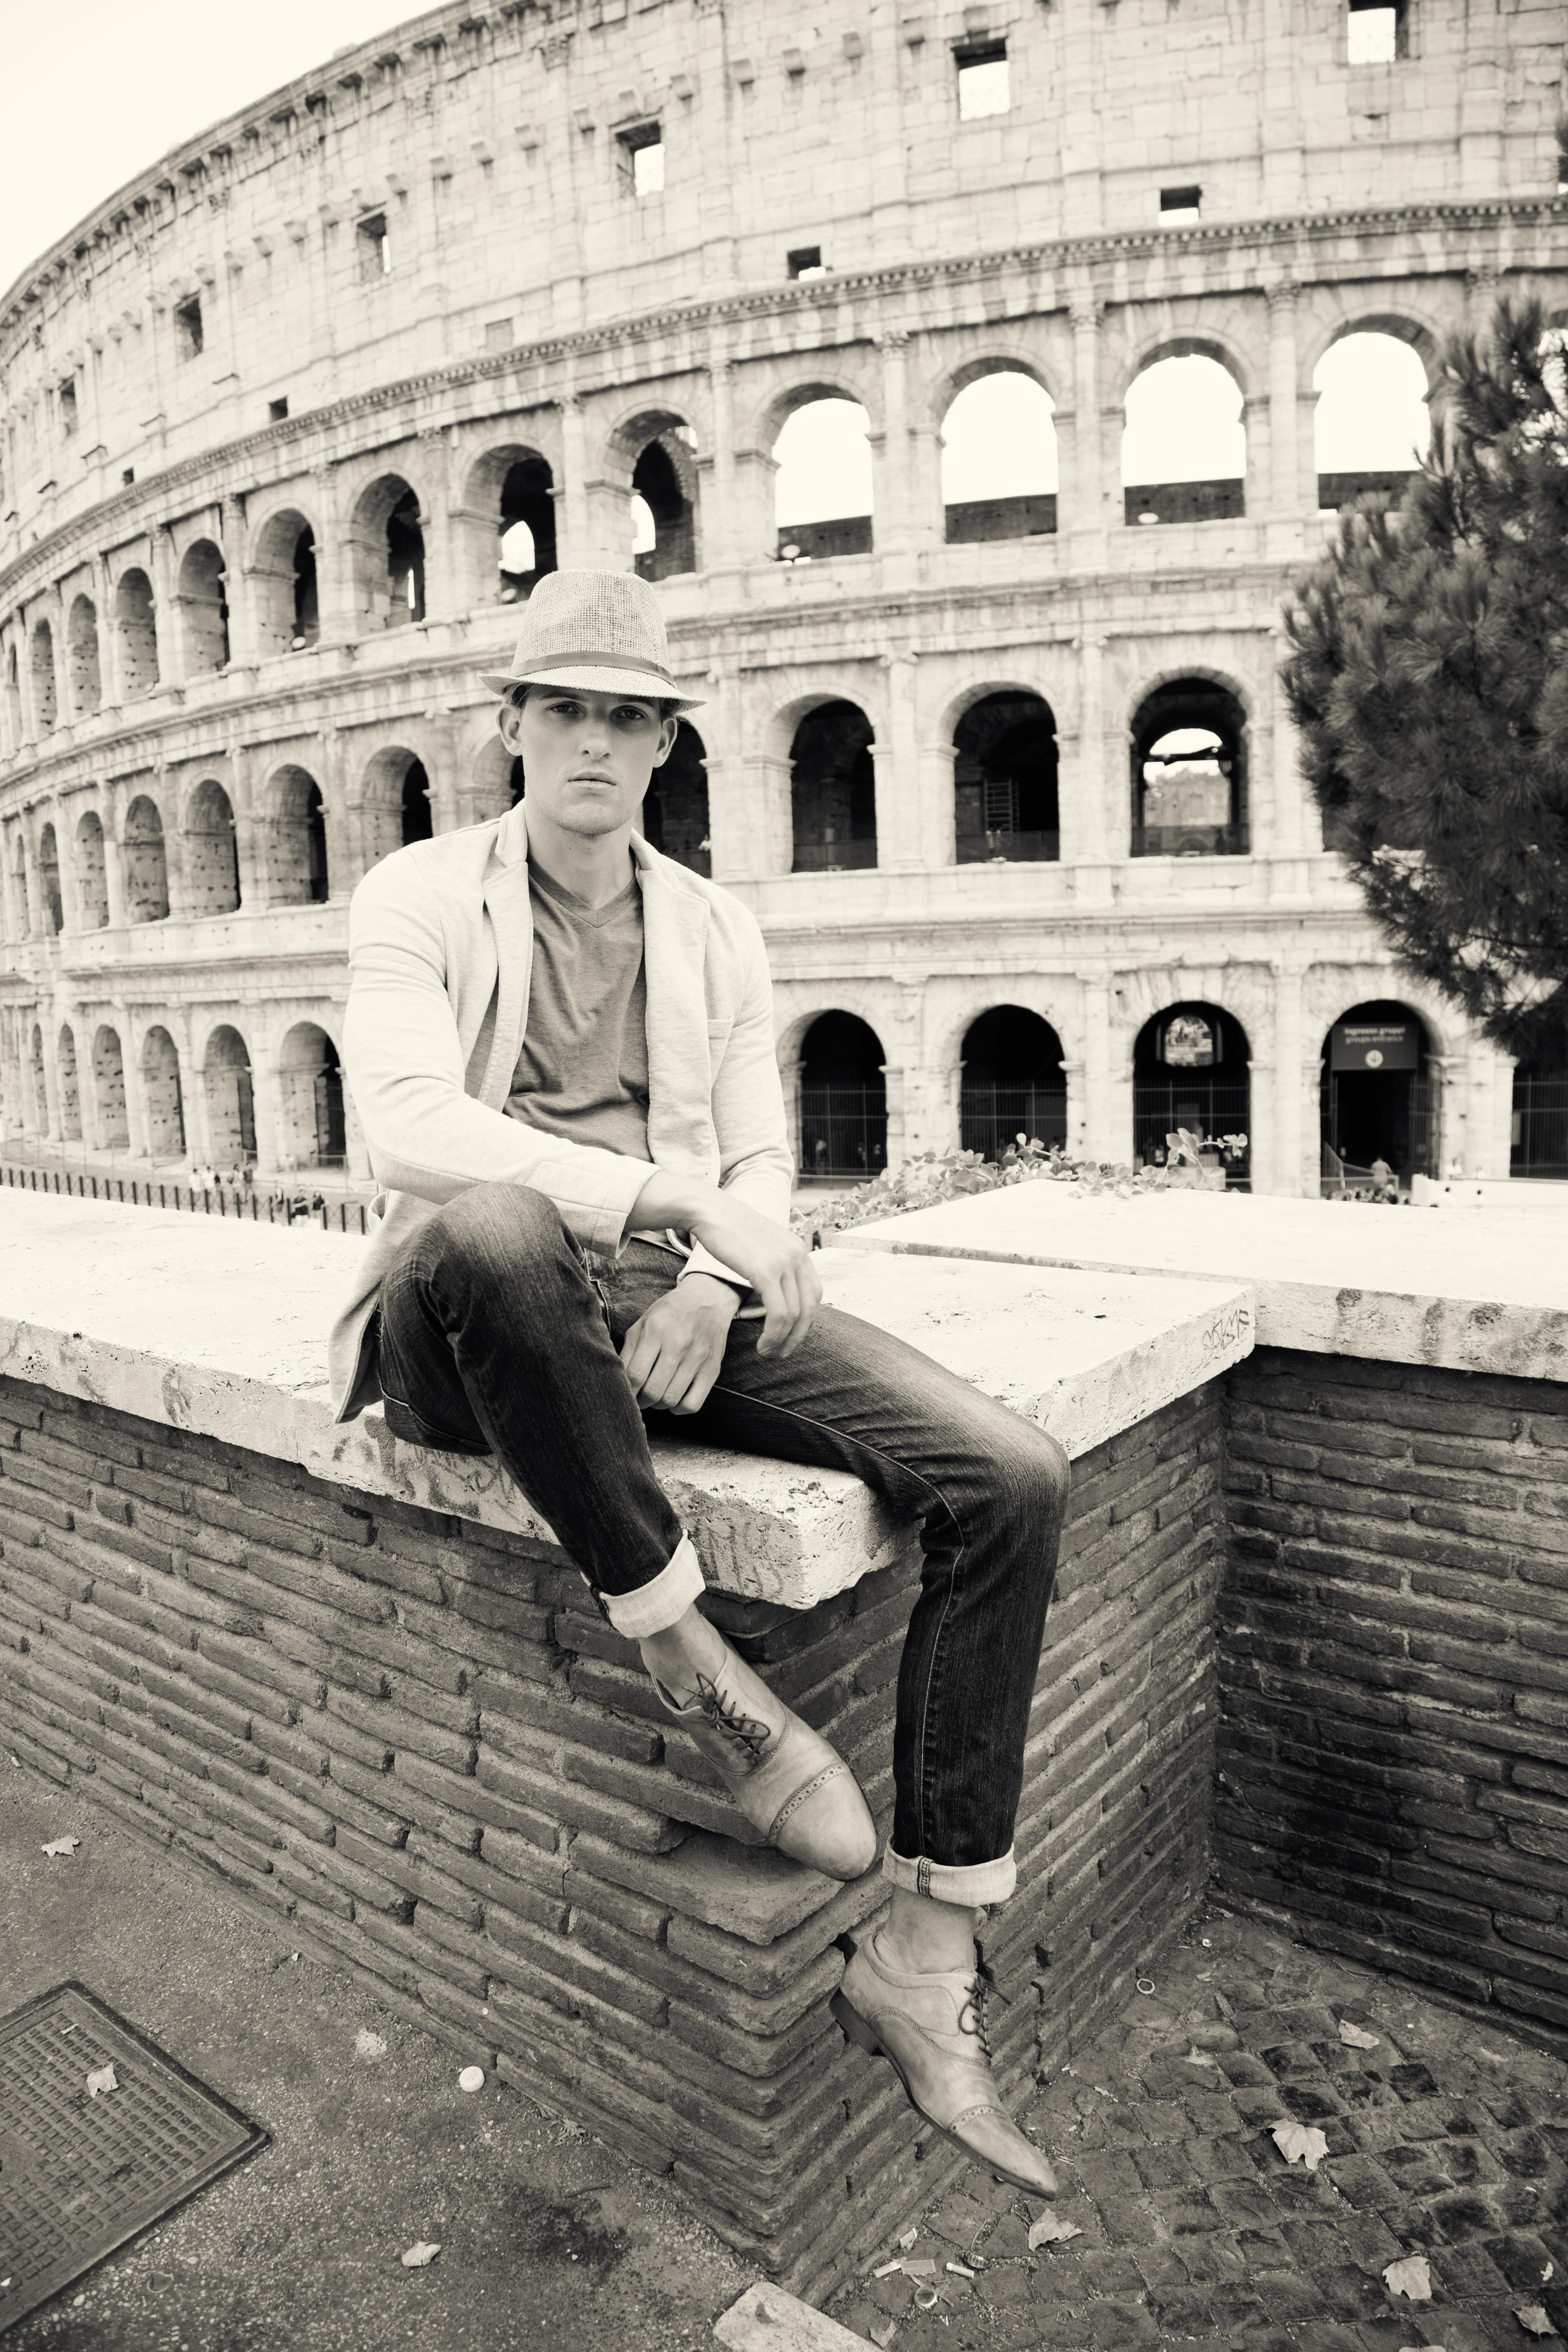 Chris H ANTM in Rome Italy